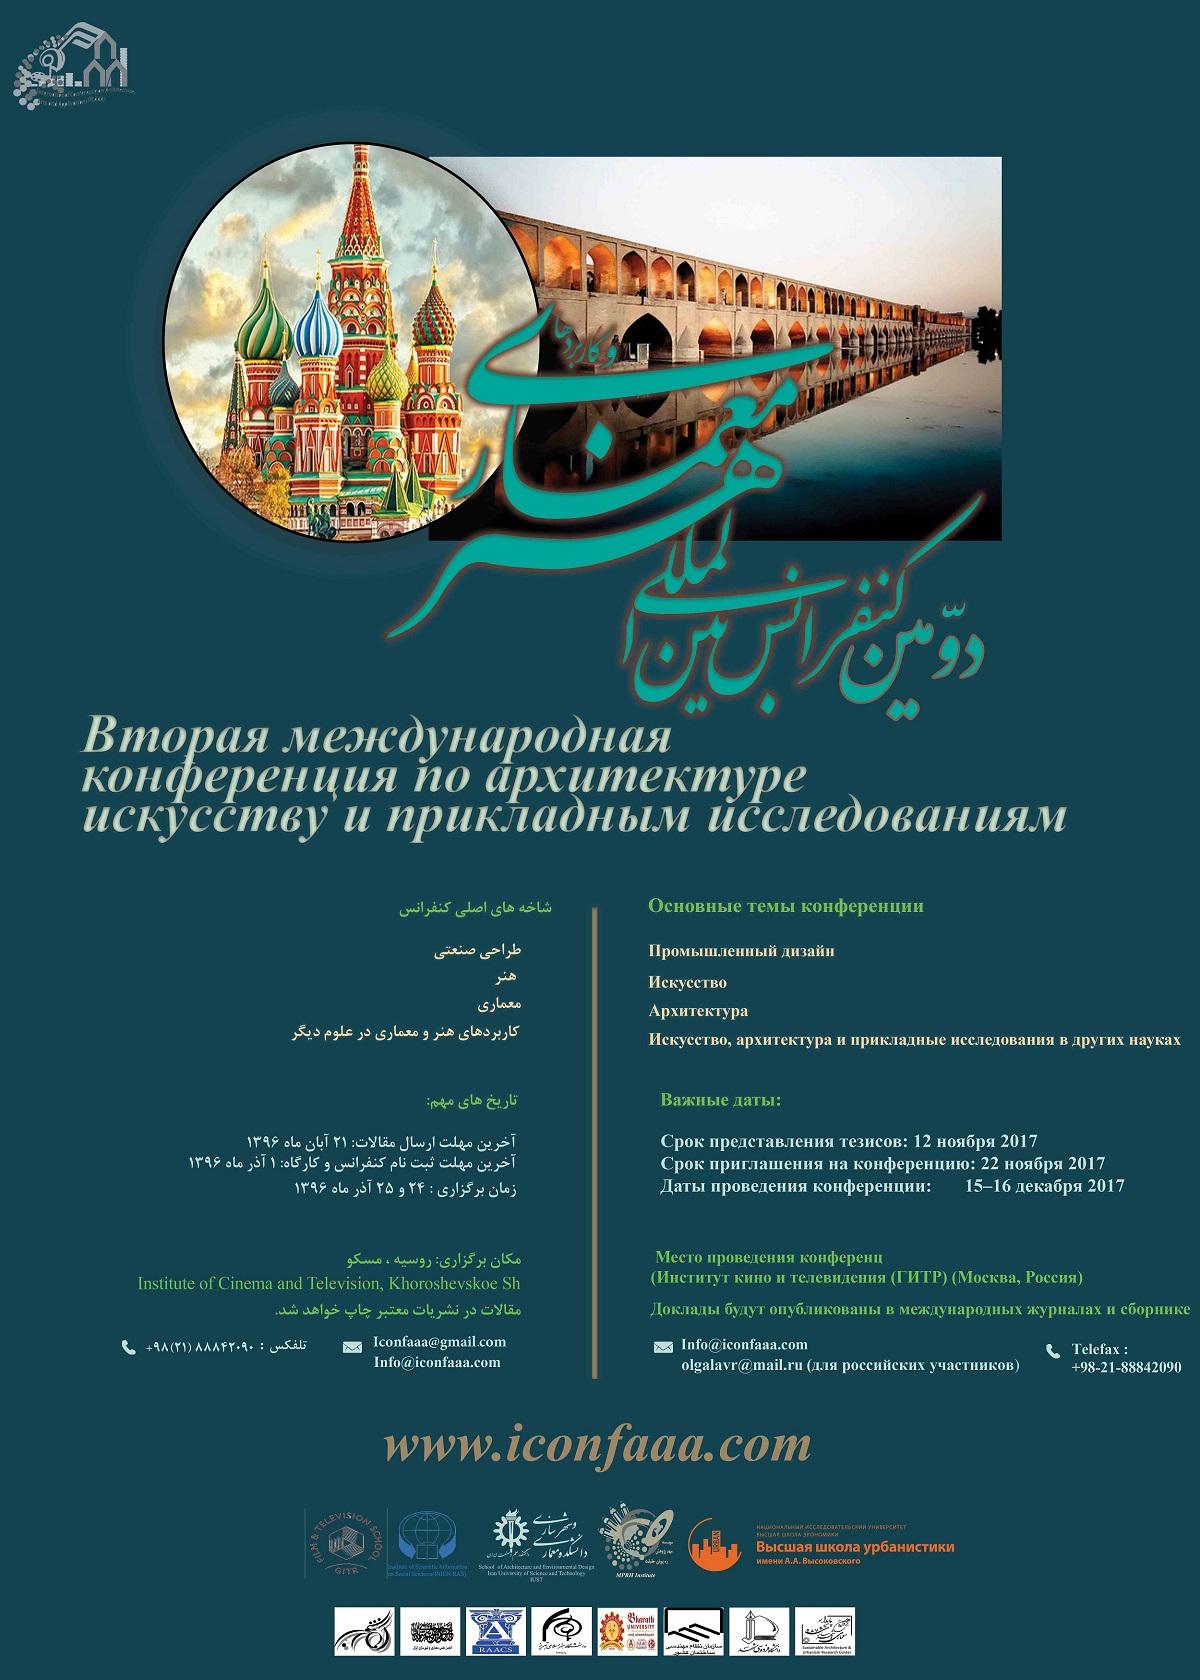 پوستر دومین کنفرانس بین المللی هنر، معماری و کاربردها